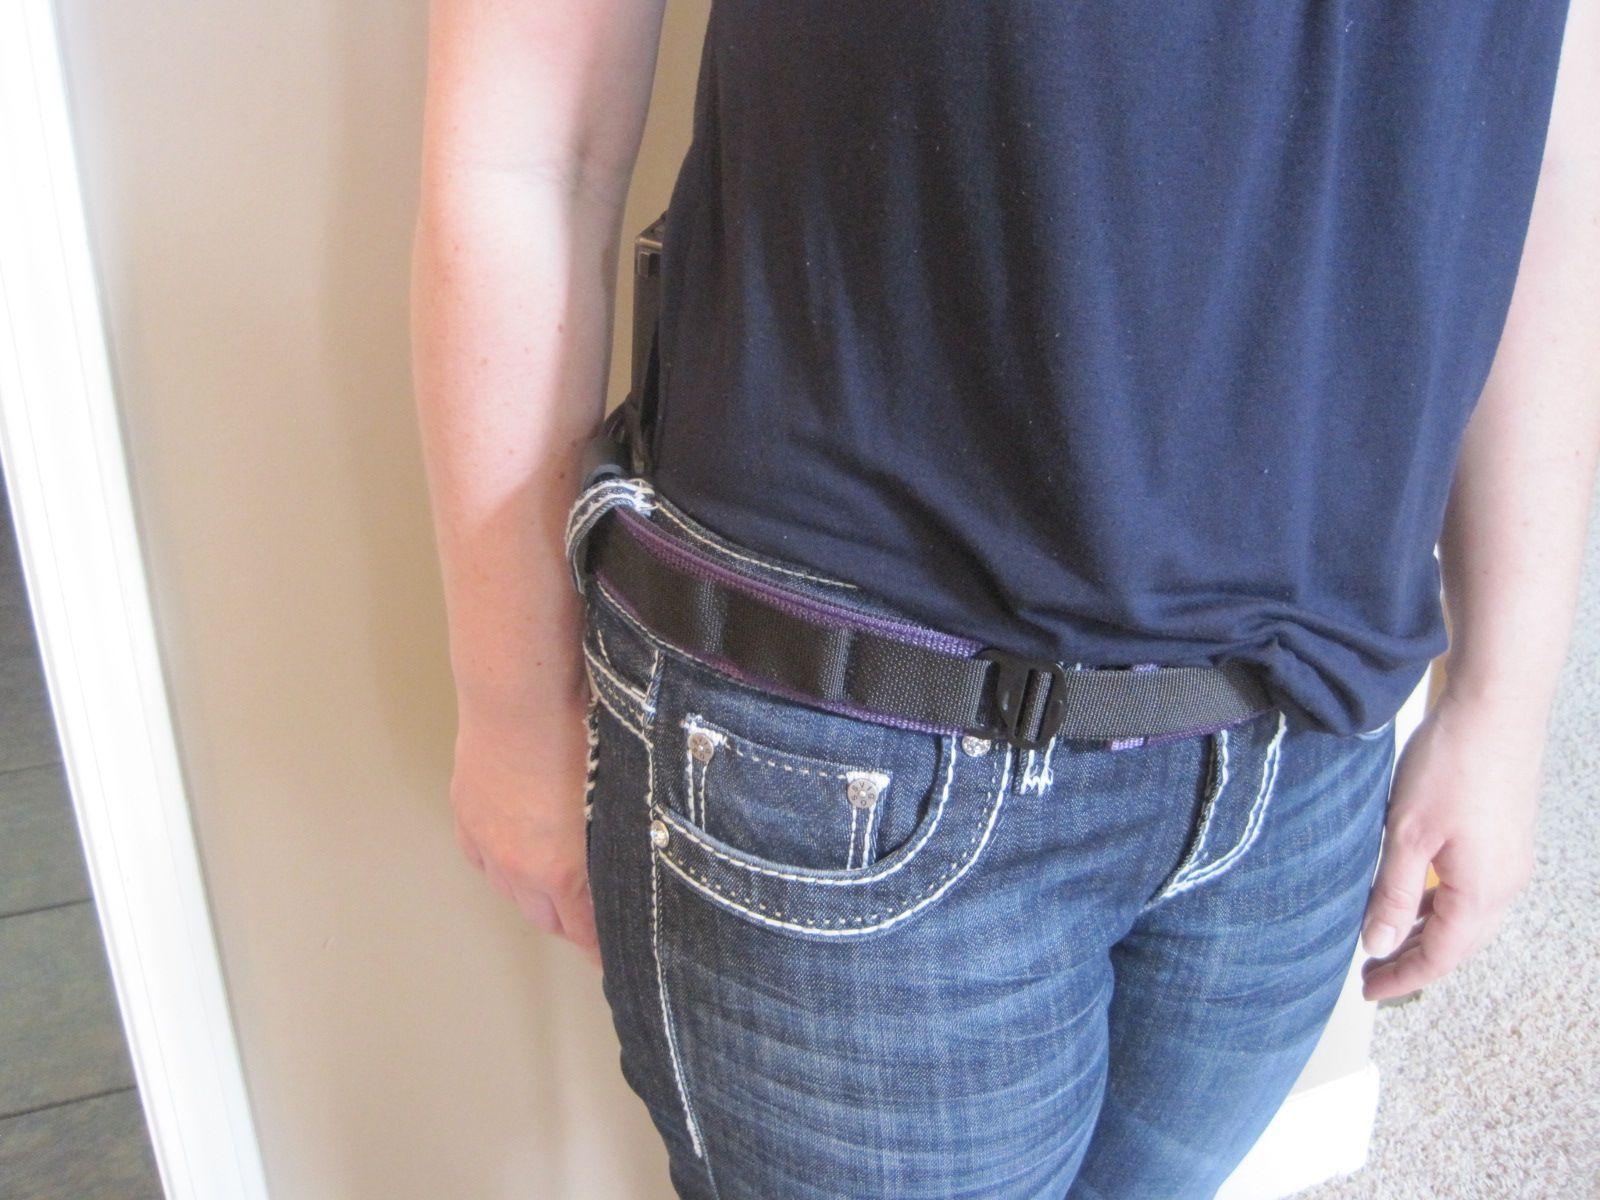 ATLAS belt, IWB Holster, Glock 19 | Carry/Conceal | Pinterest | 19 ...